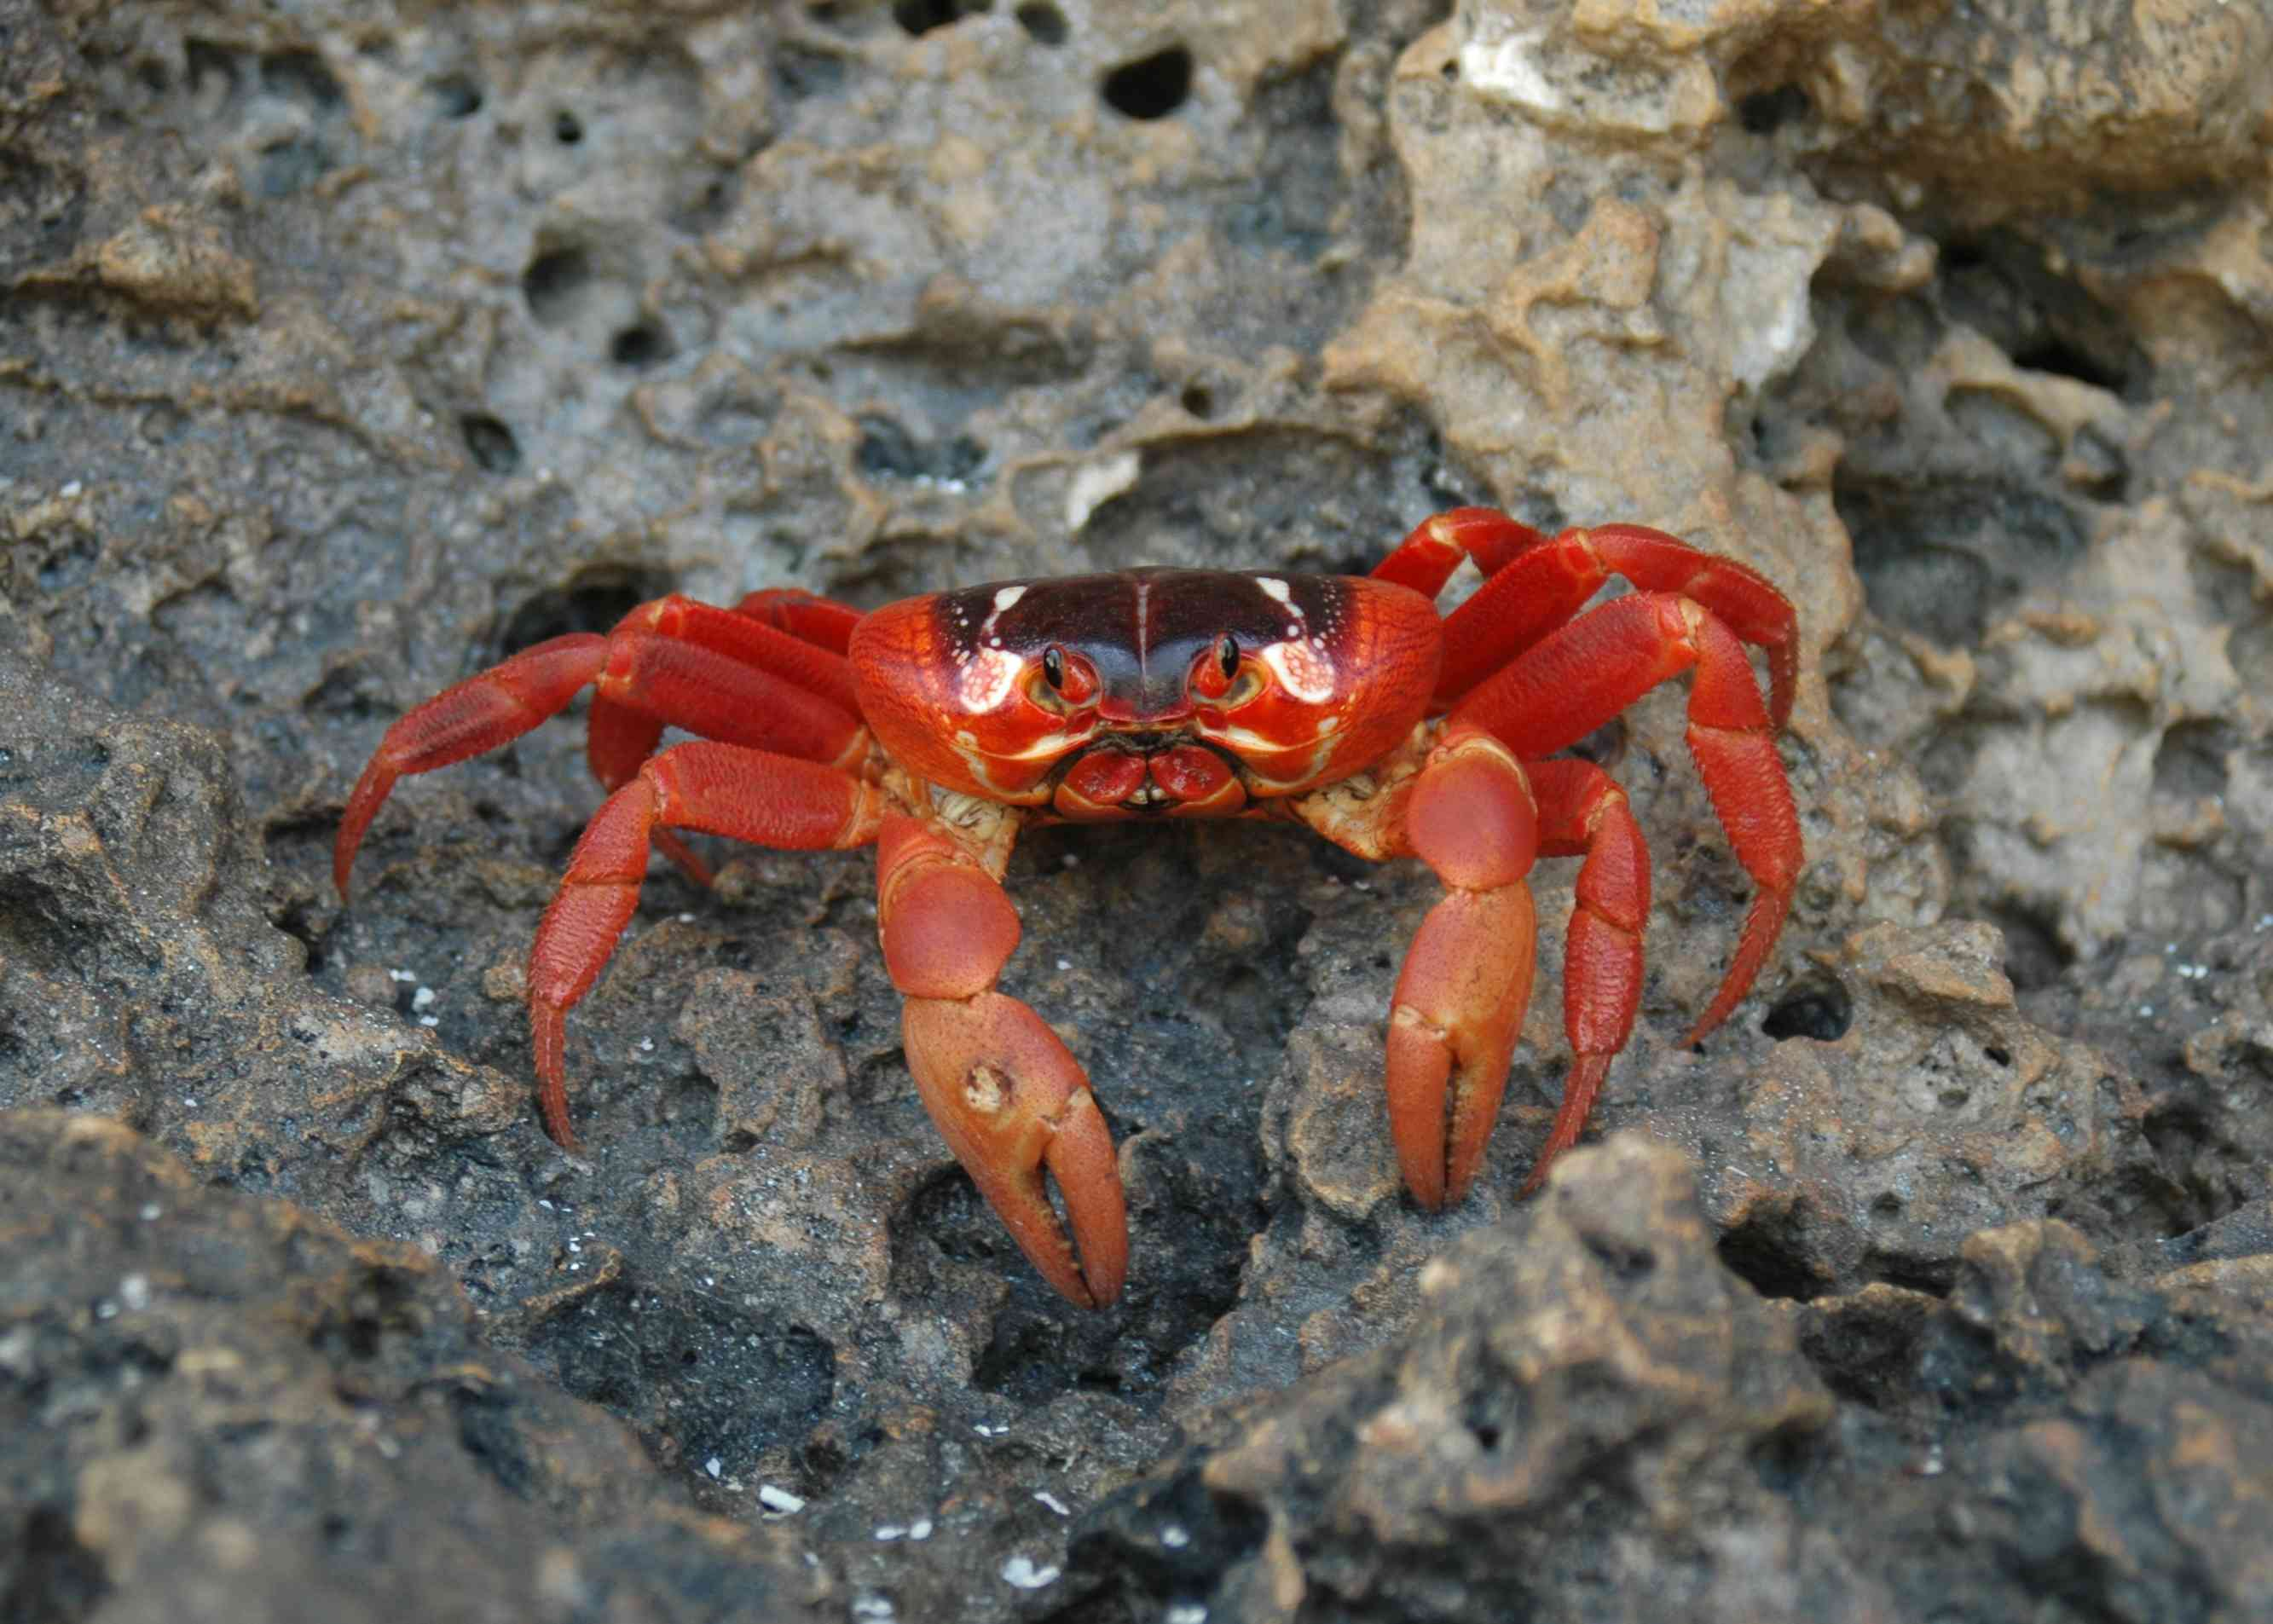 Close-up of rare red crab of the Christmas Island, Australia